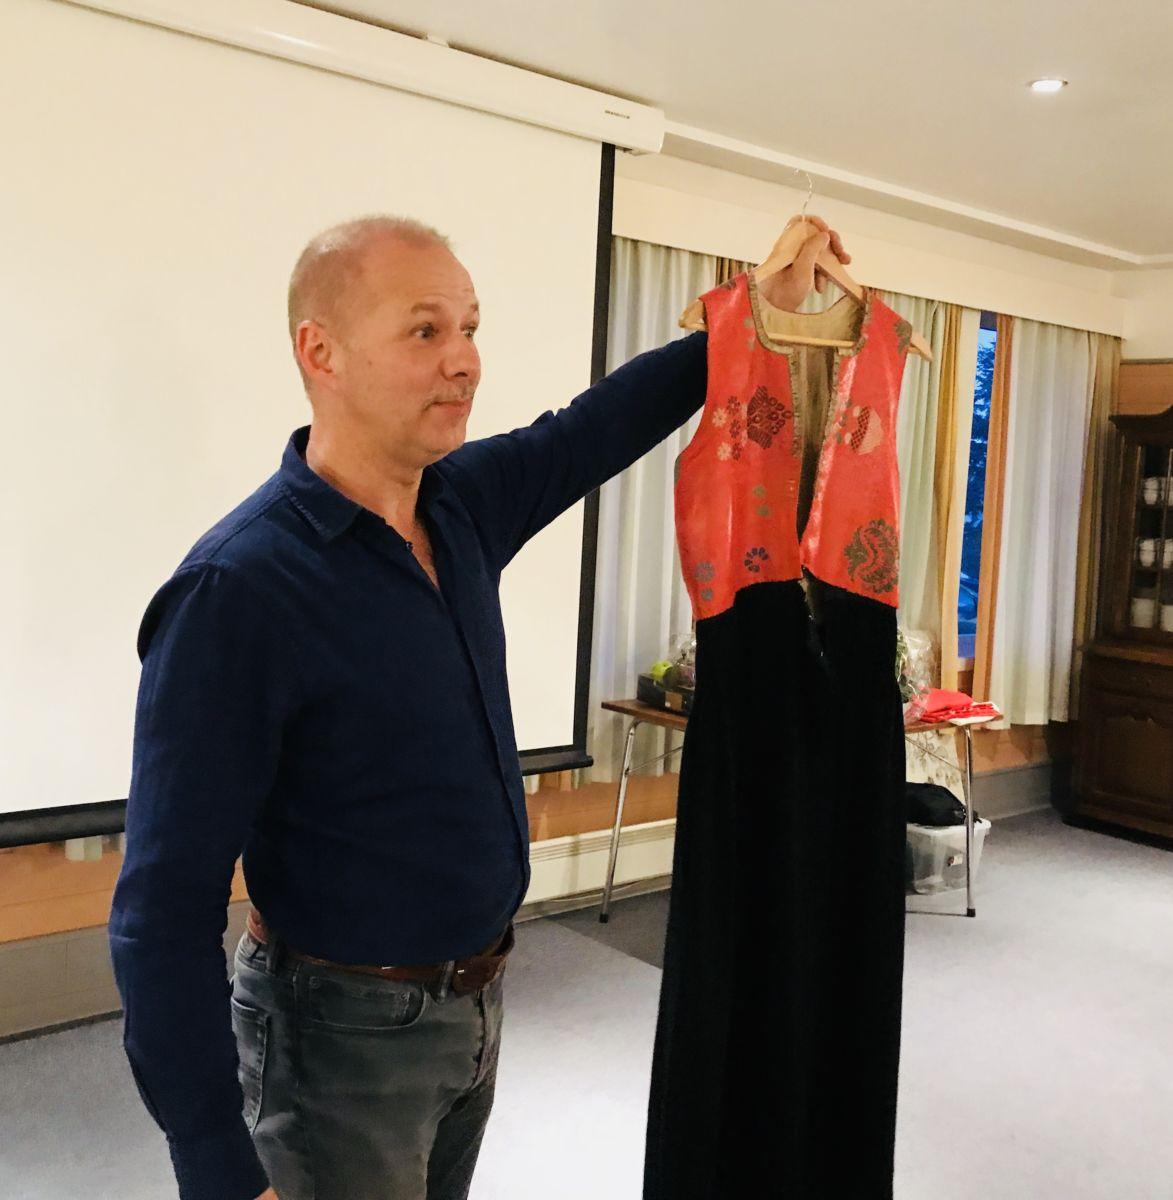 Ole Kristian Gundersen kåserer om Nordmørsbunaden i Frei historielag. Fot: Dordi J H